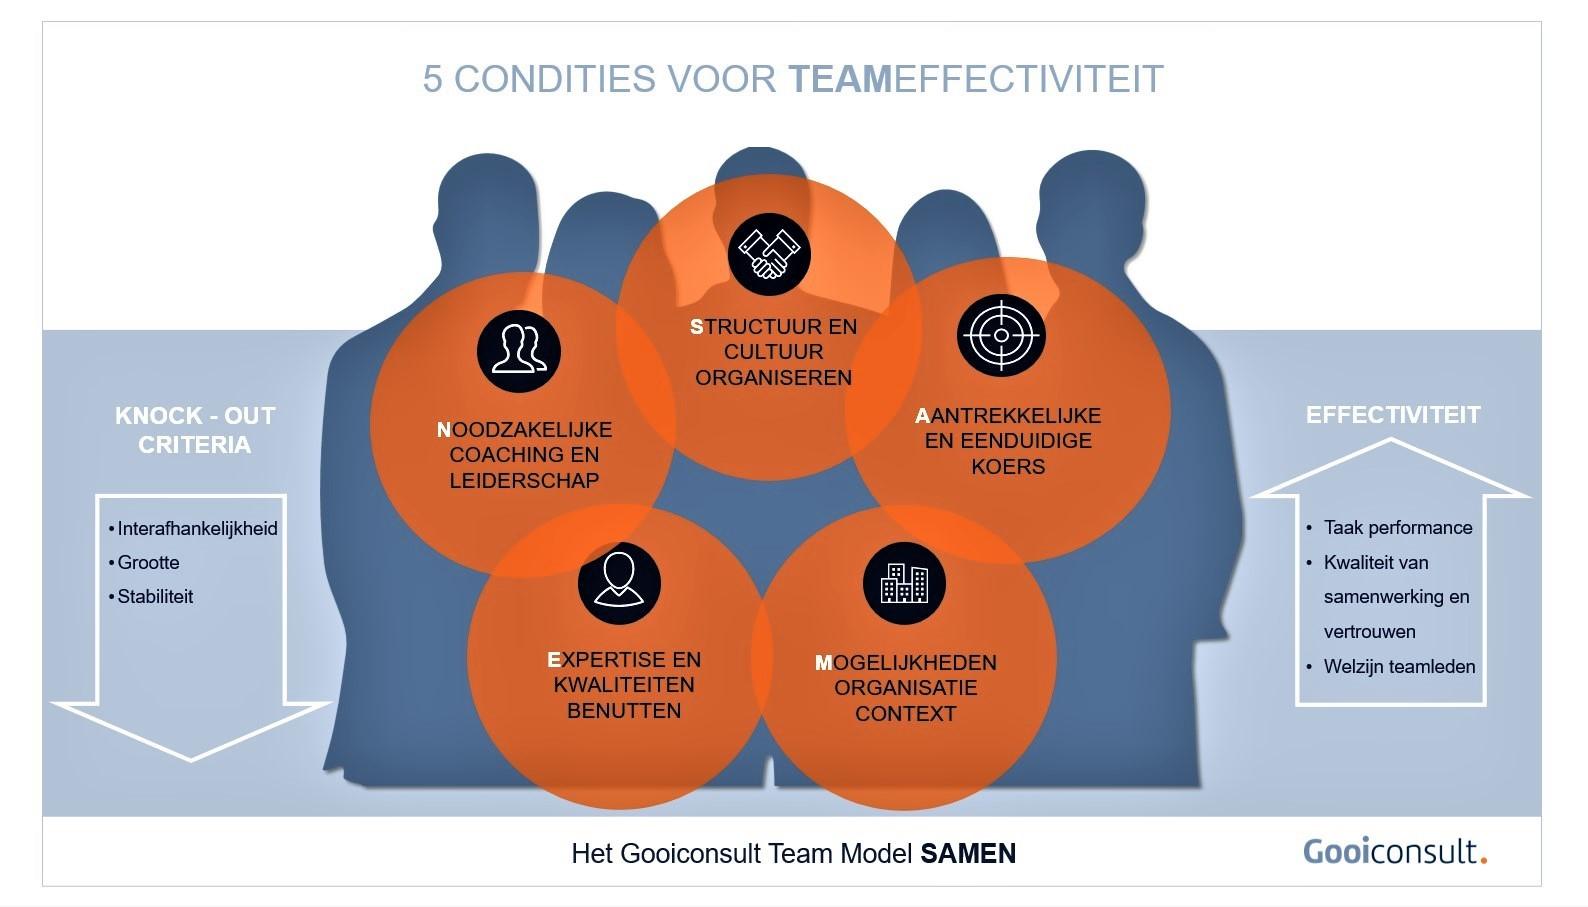 Gooiconsult Team Model SAMEN